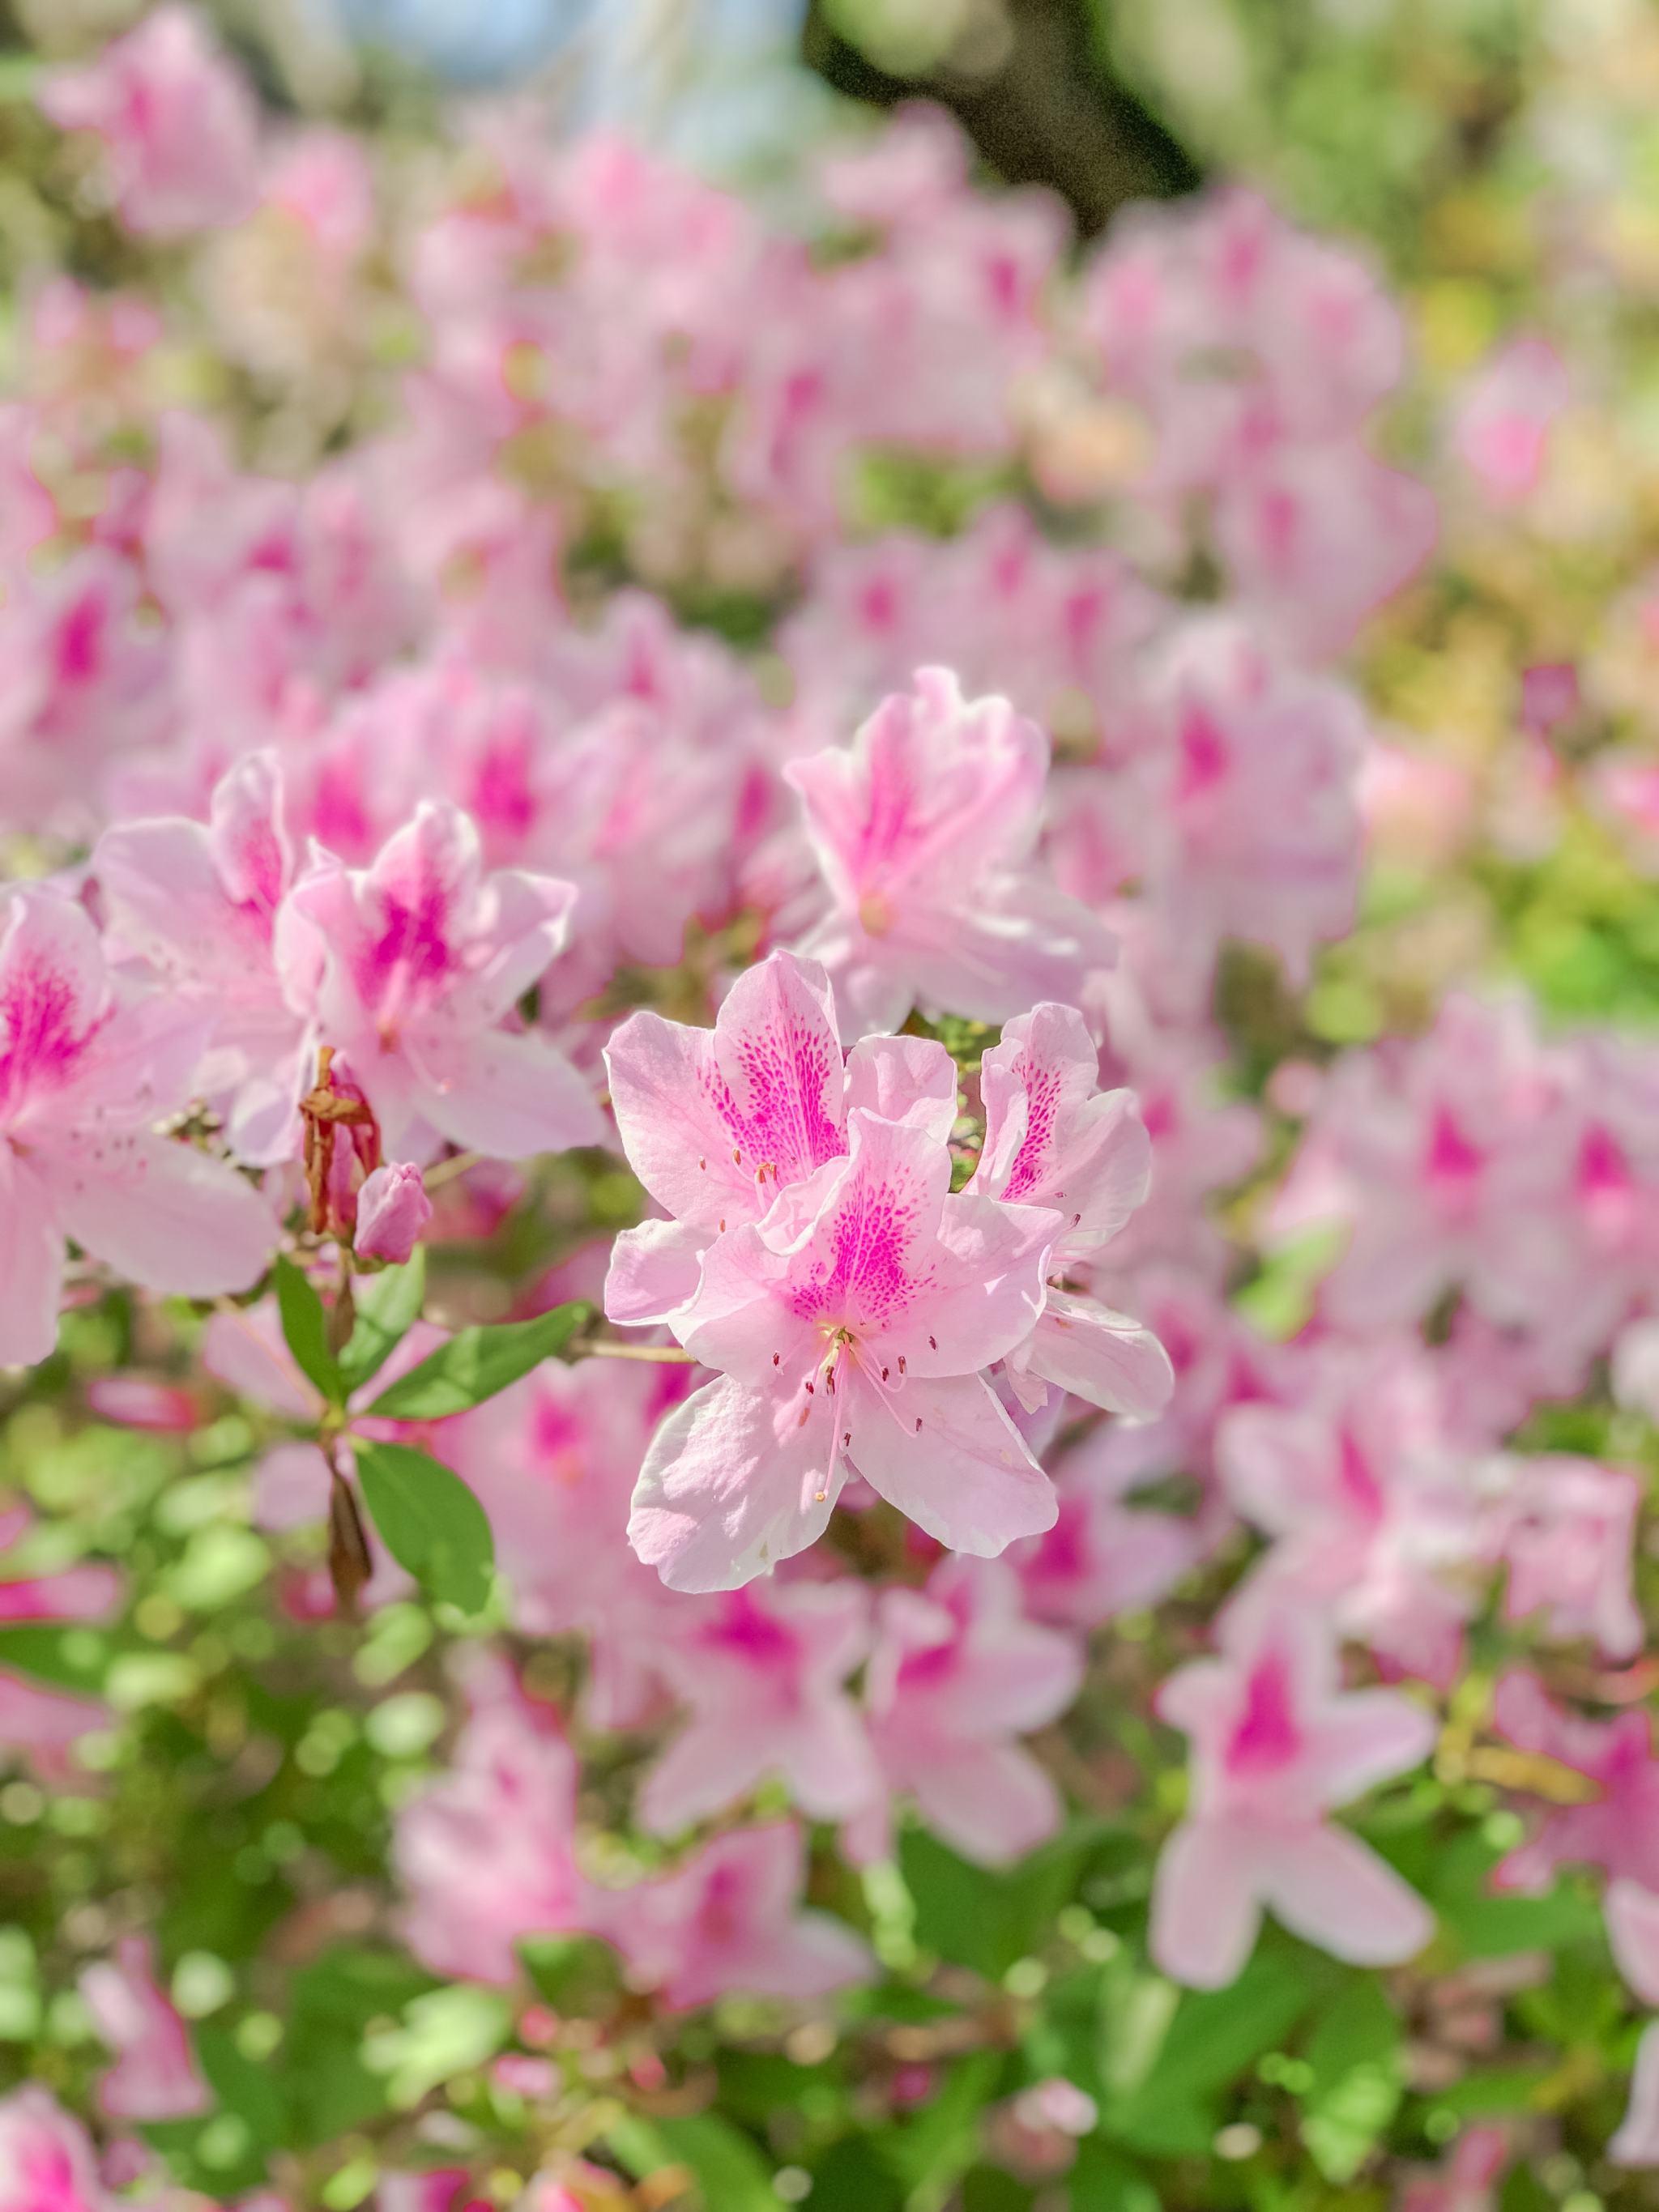 Bijuleni - Brookgreen Gardens flowers, Myrtle Beach